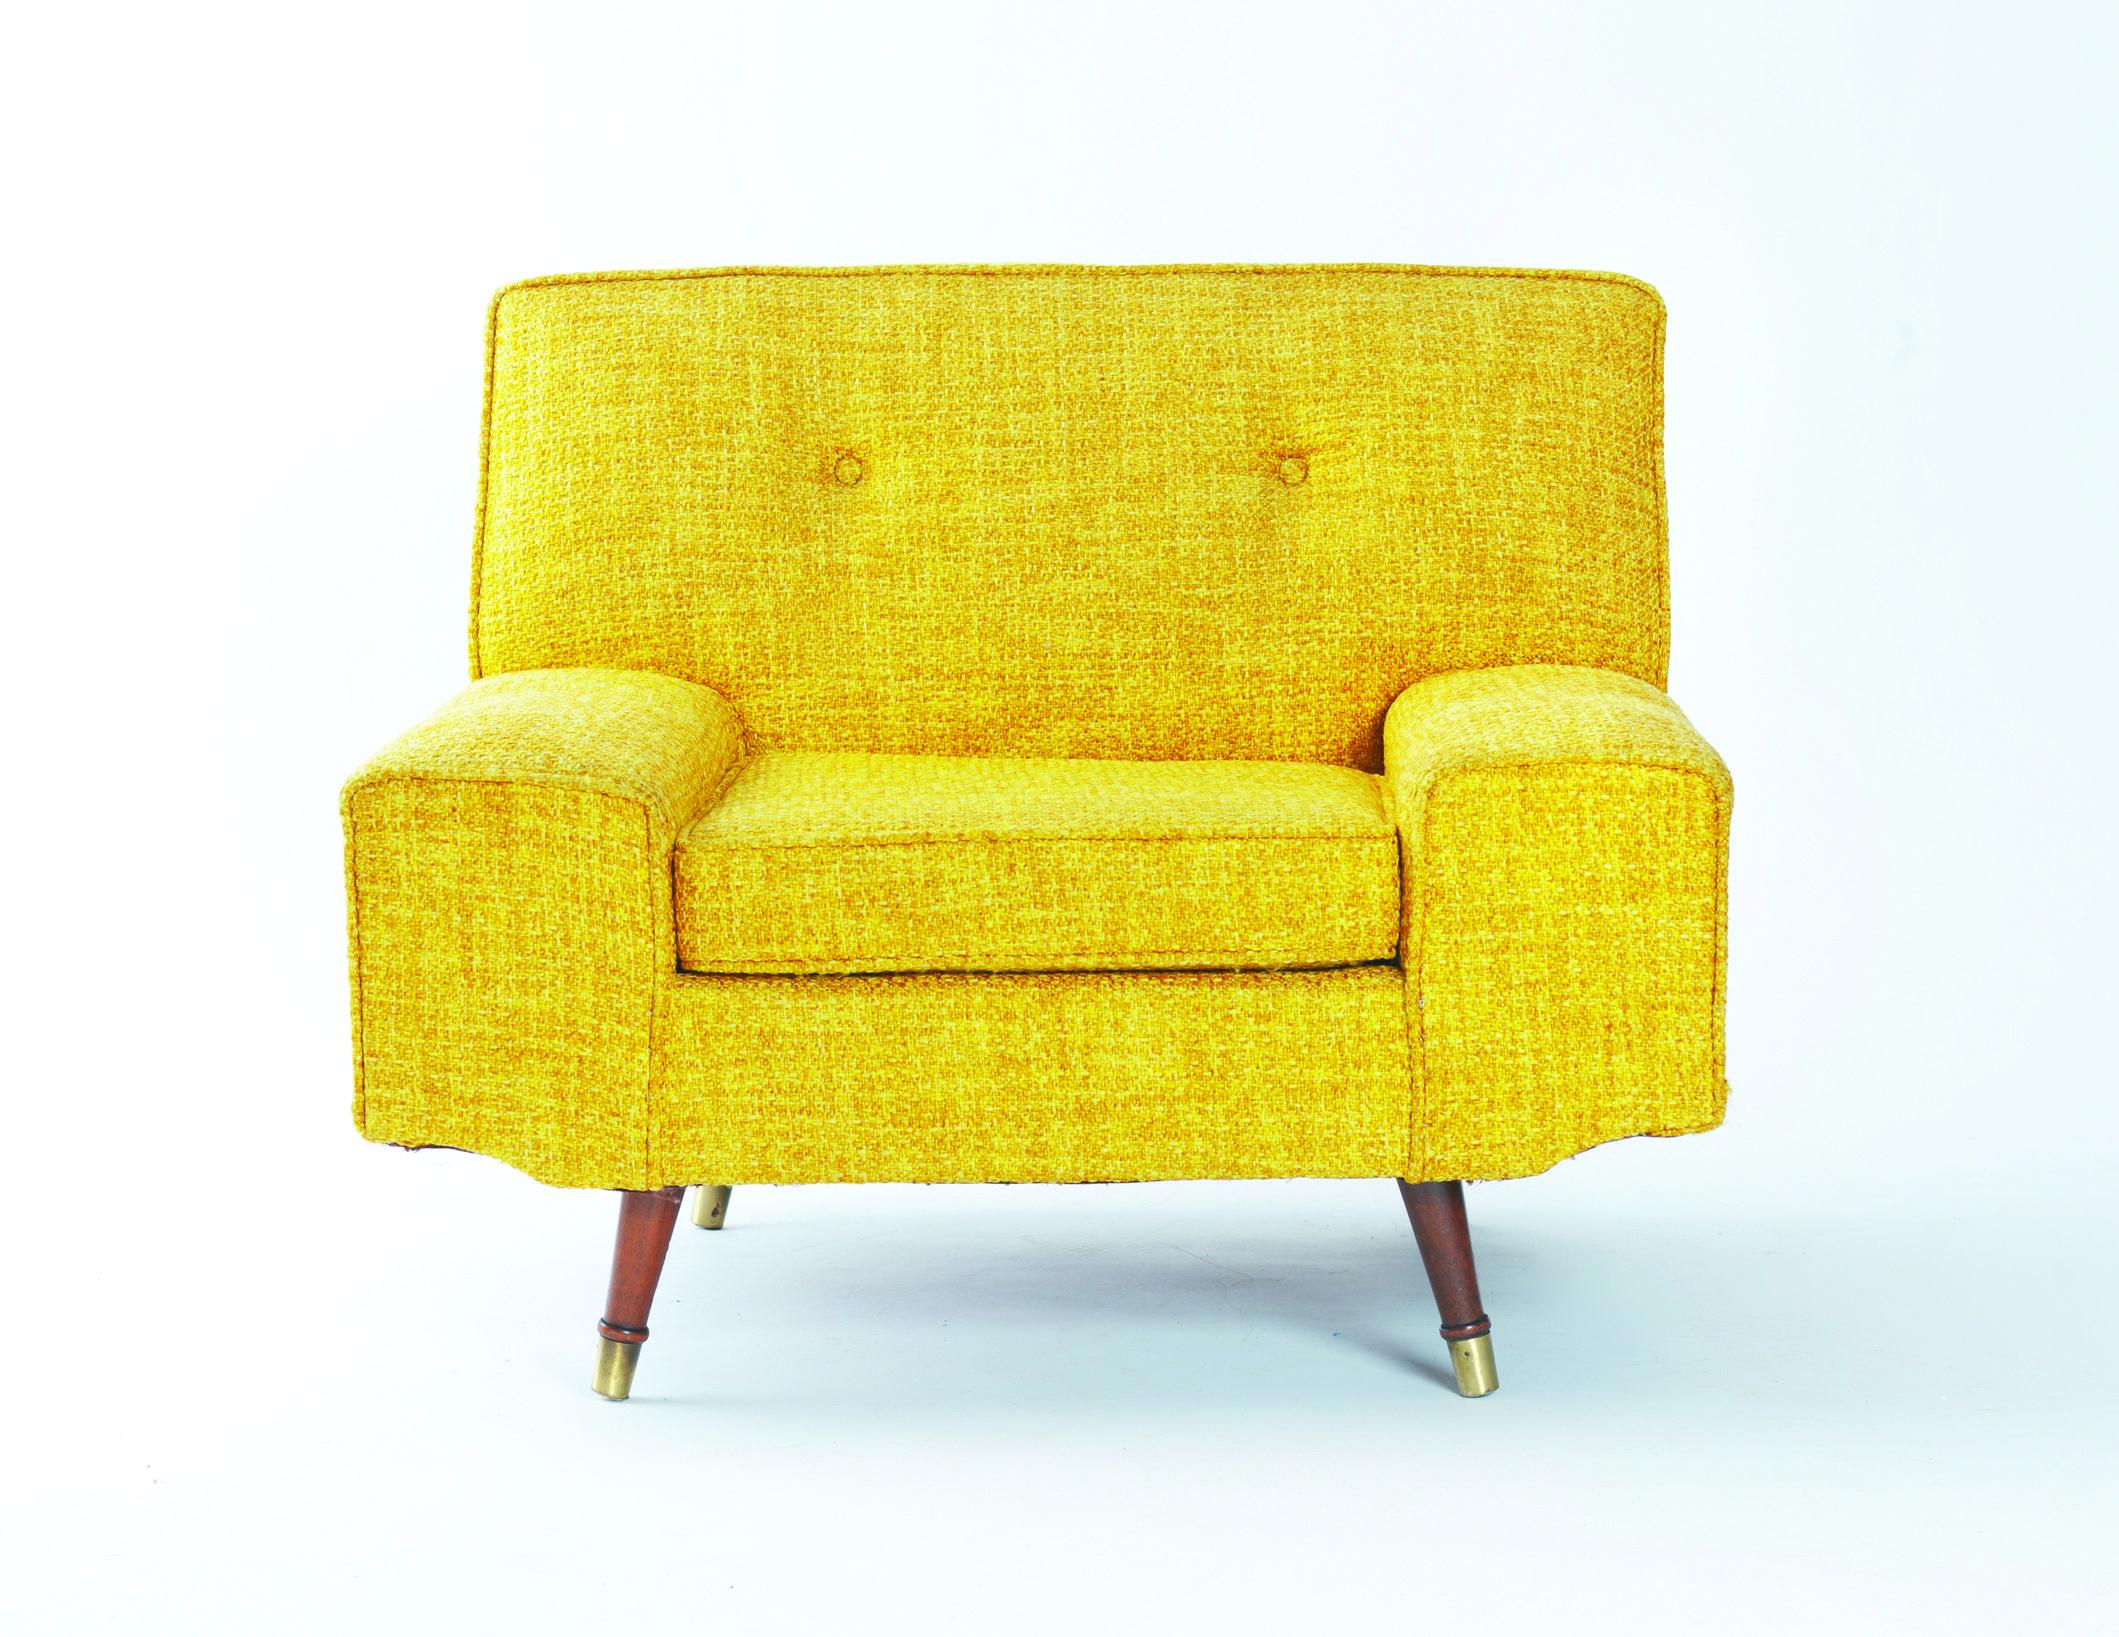 Fauteuil Jaune Vintage fauteuil jaune vintage 1957 | meubles | pinterest | salons